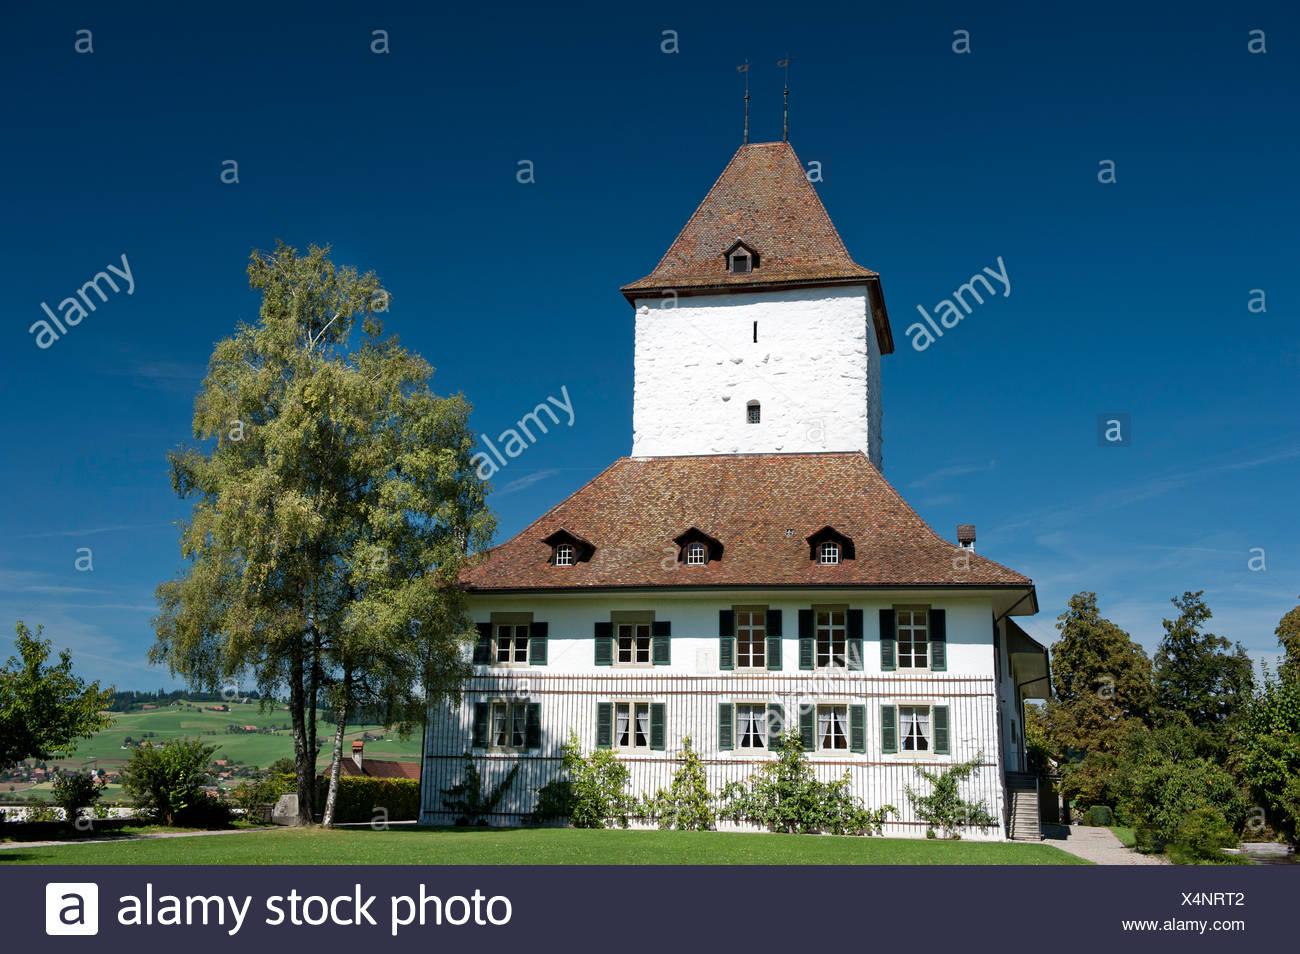 aristocracy, canton Bern, Mittelland, castle, Schlosswil, Switzerland - Stock Image